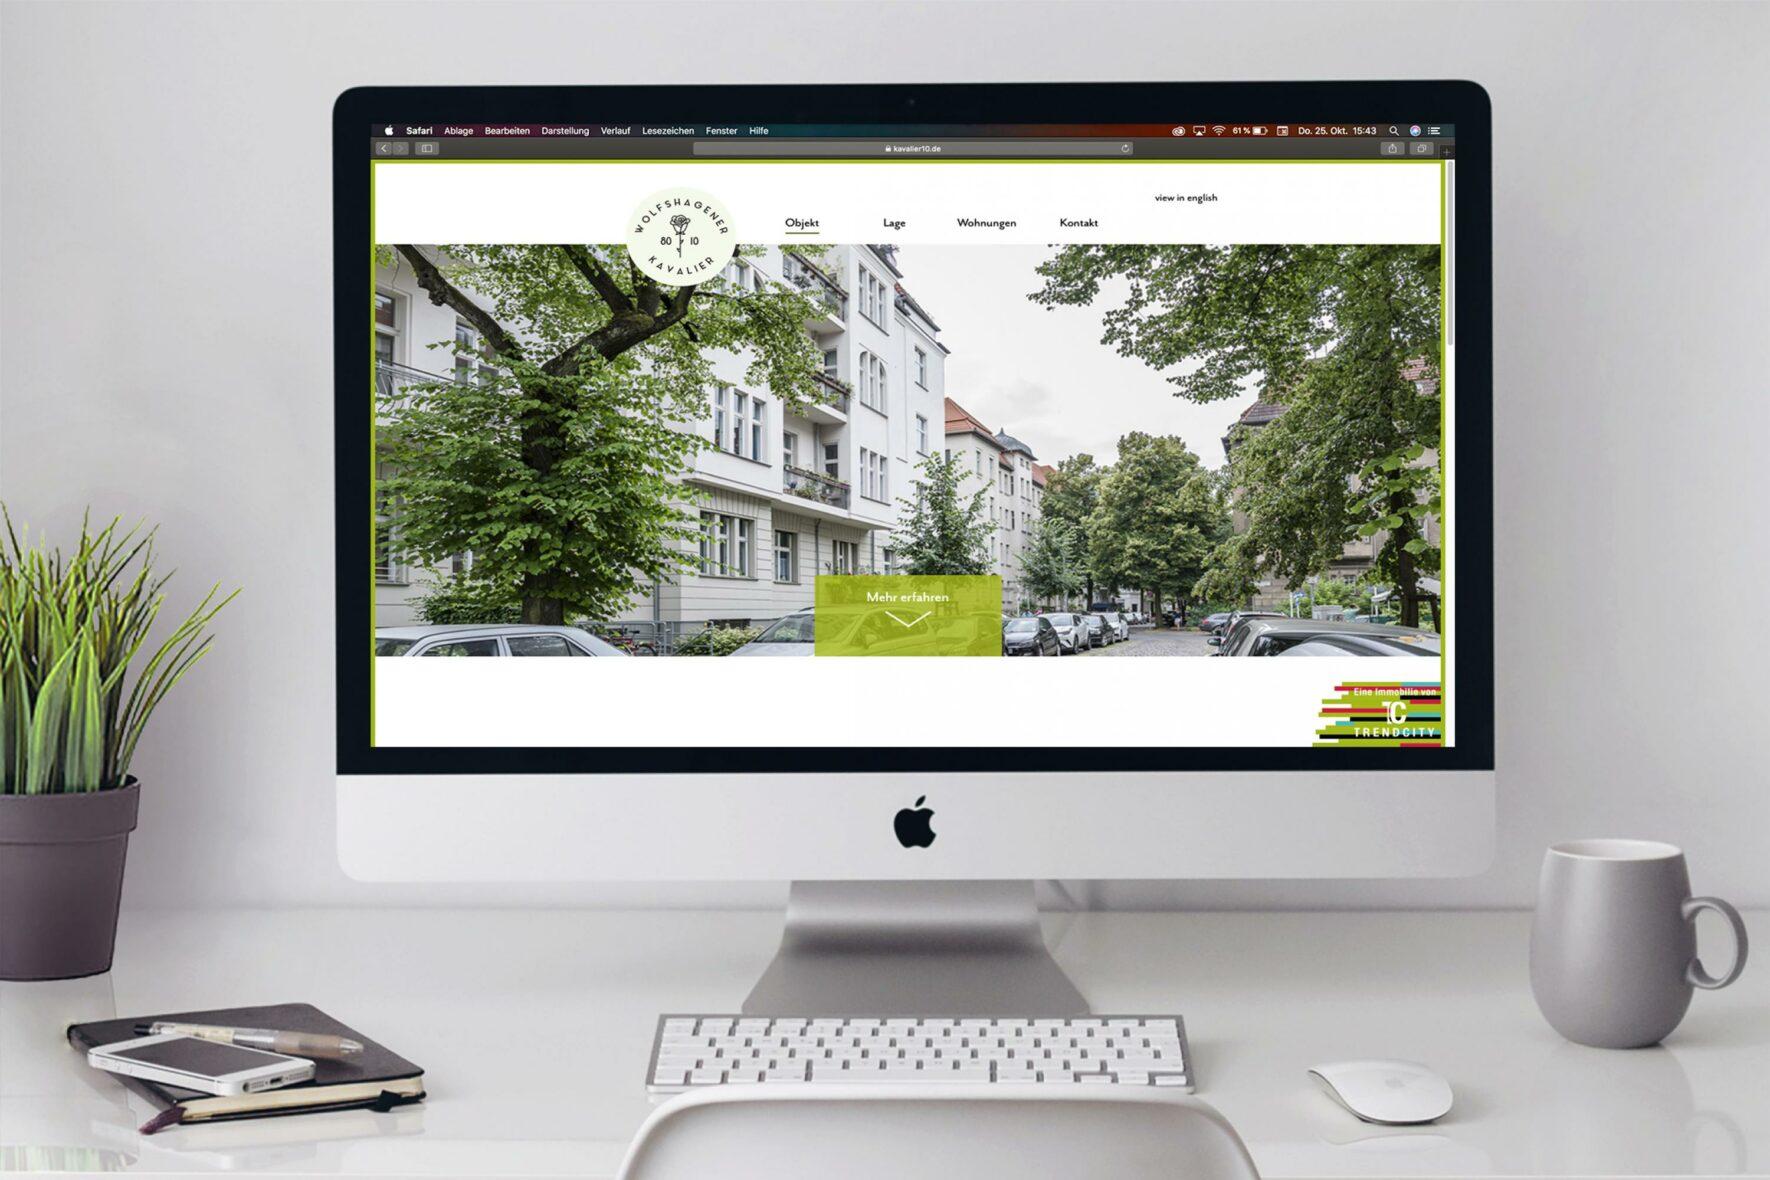 Webiste-Objekte-Branding-Trendcity-Immobilien-Kavalierstrasse-Webdesign-Corporat-Design-1 Kopie